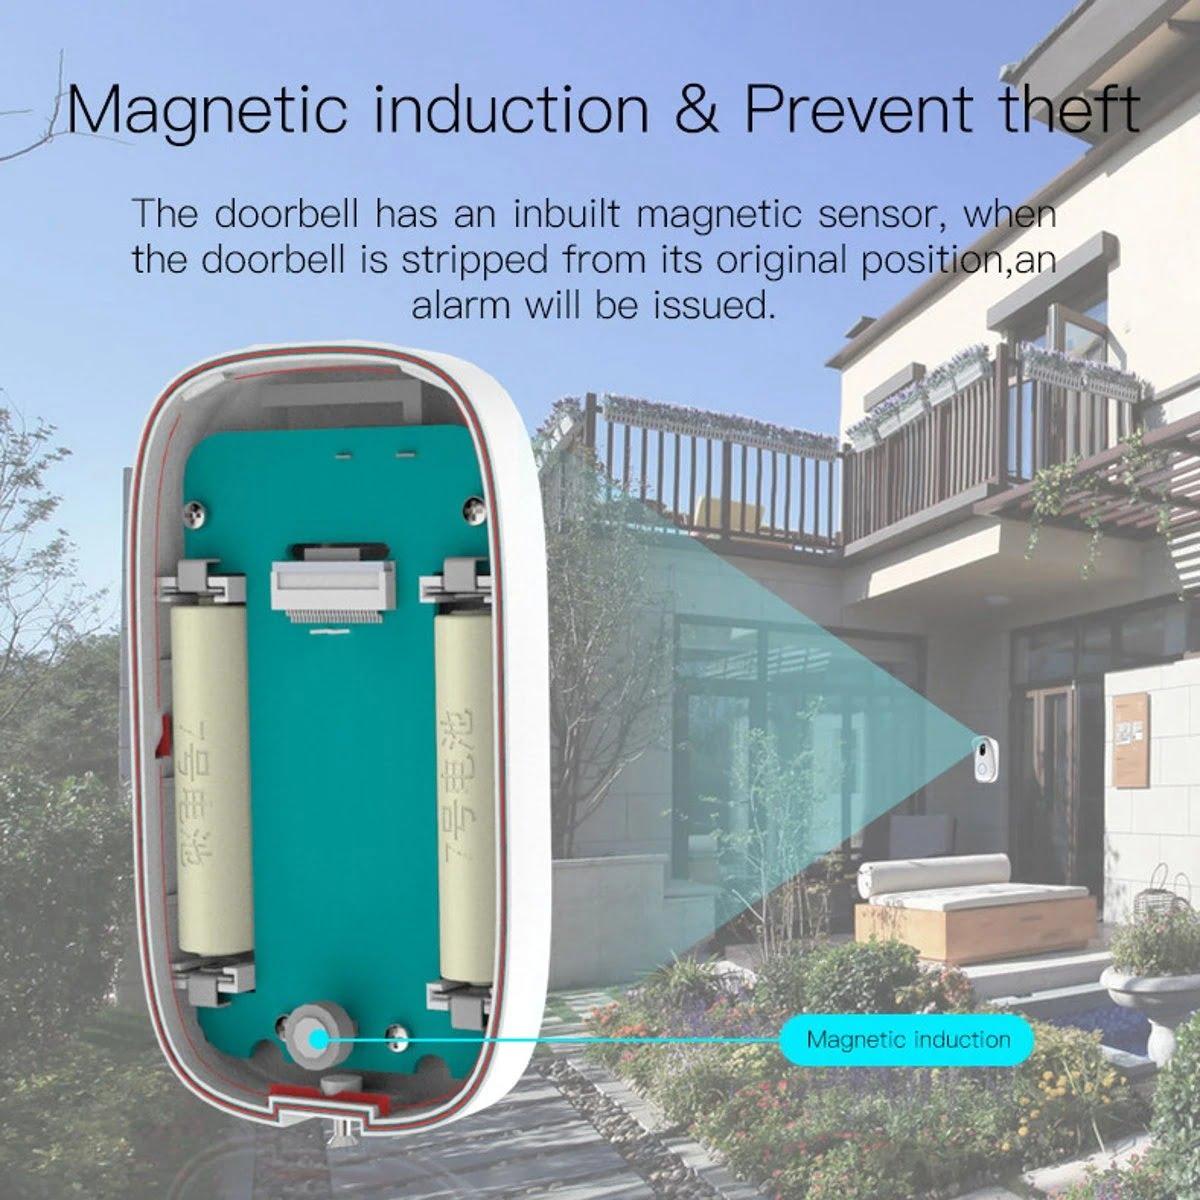 SH02 Smart Wireless Doorbell Lens Video HD Security Camera Night Vision App Control (18)